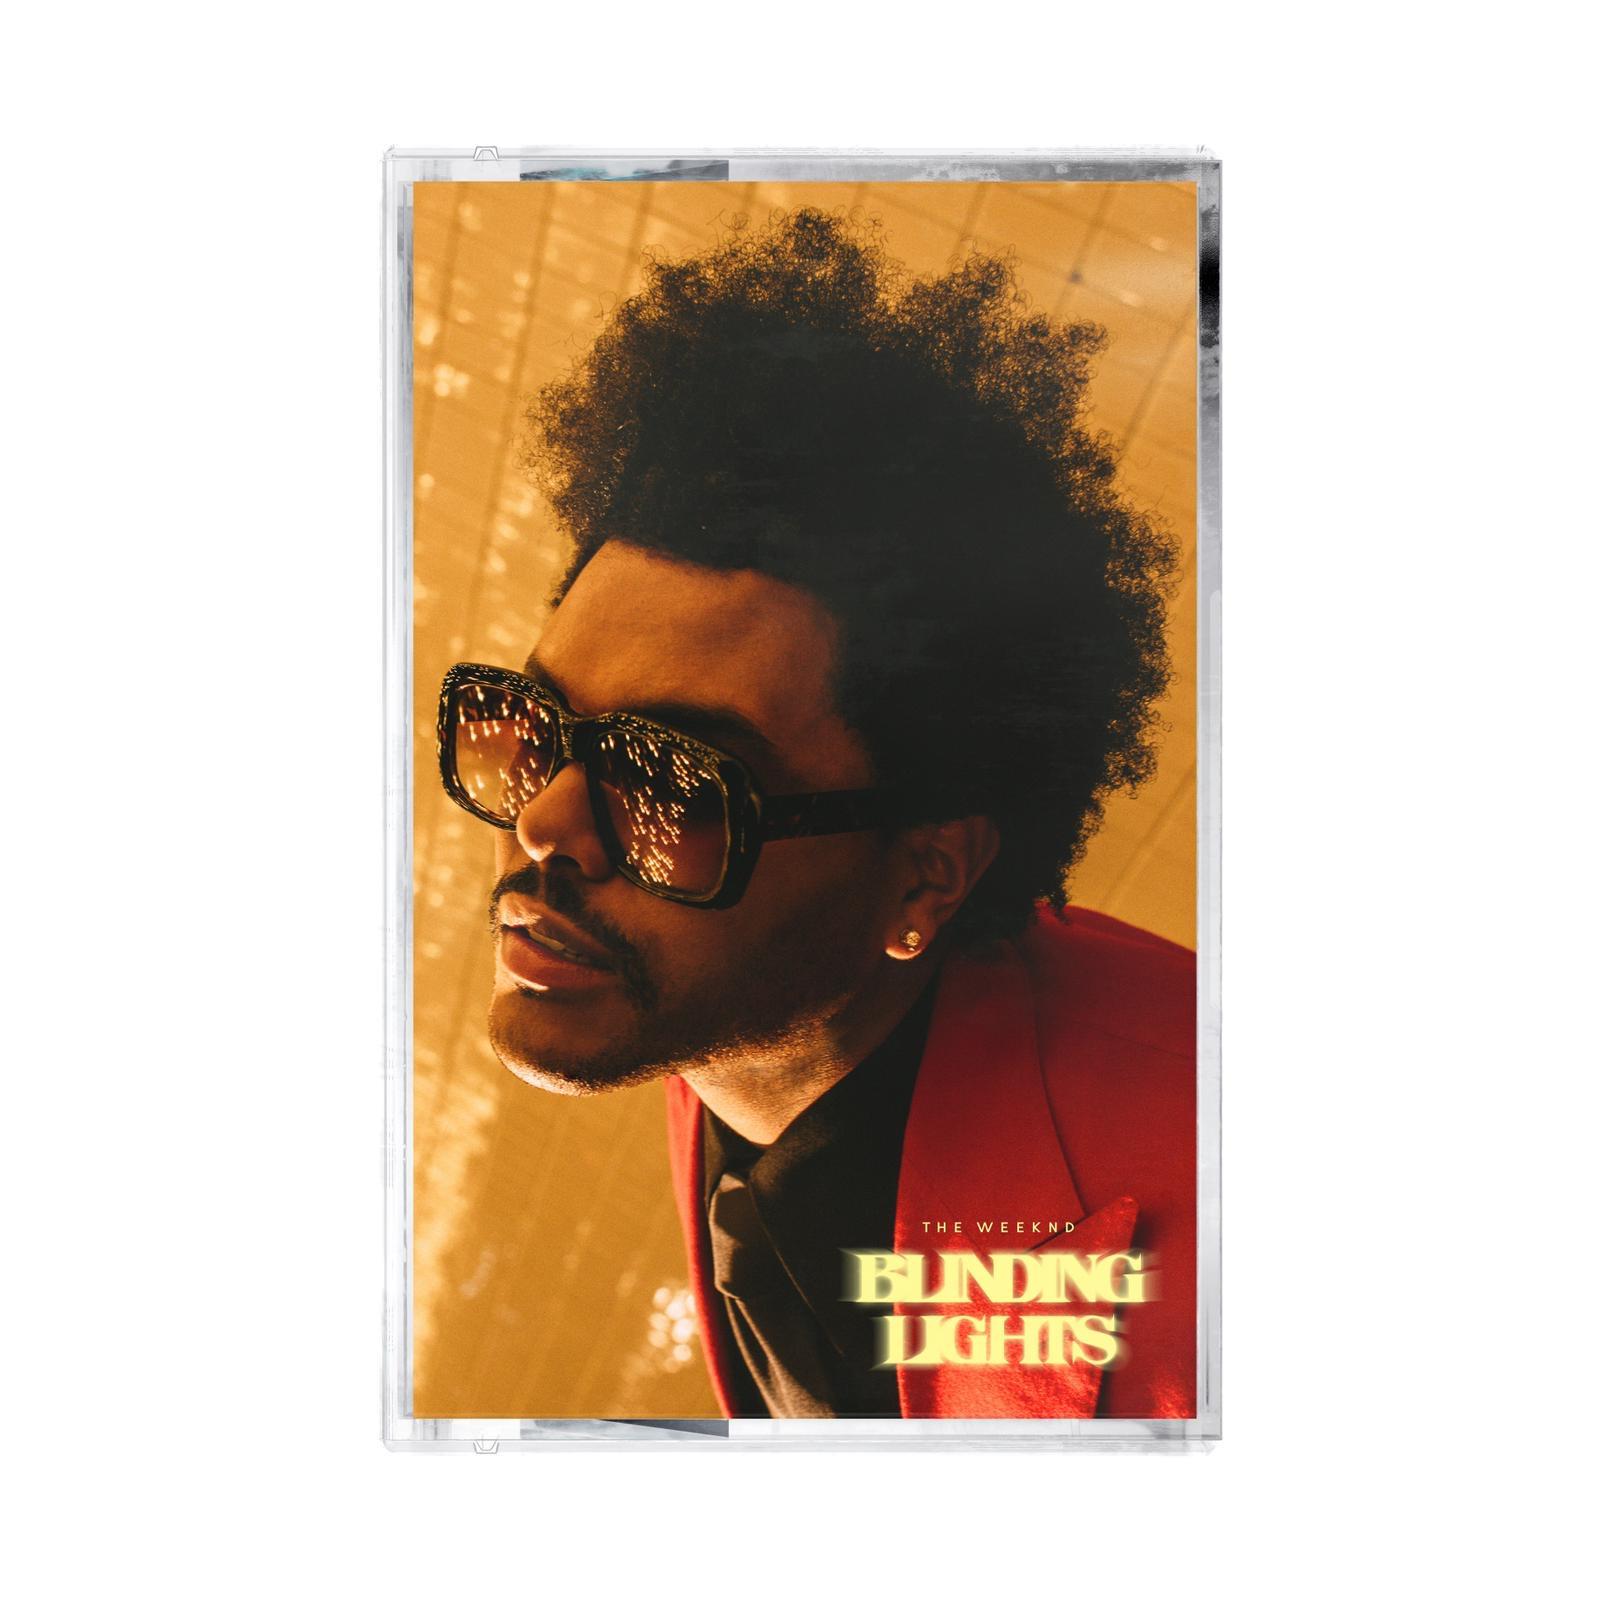 The Weeknd: Blinding Lights: Cassette Single